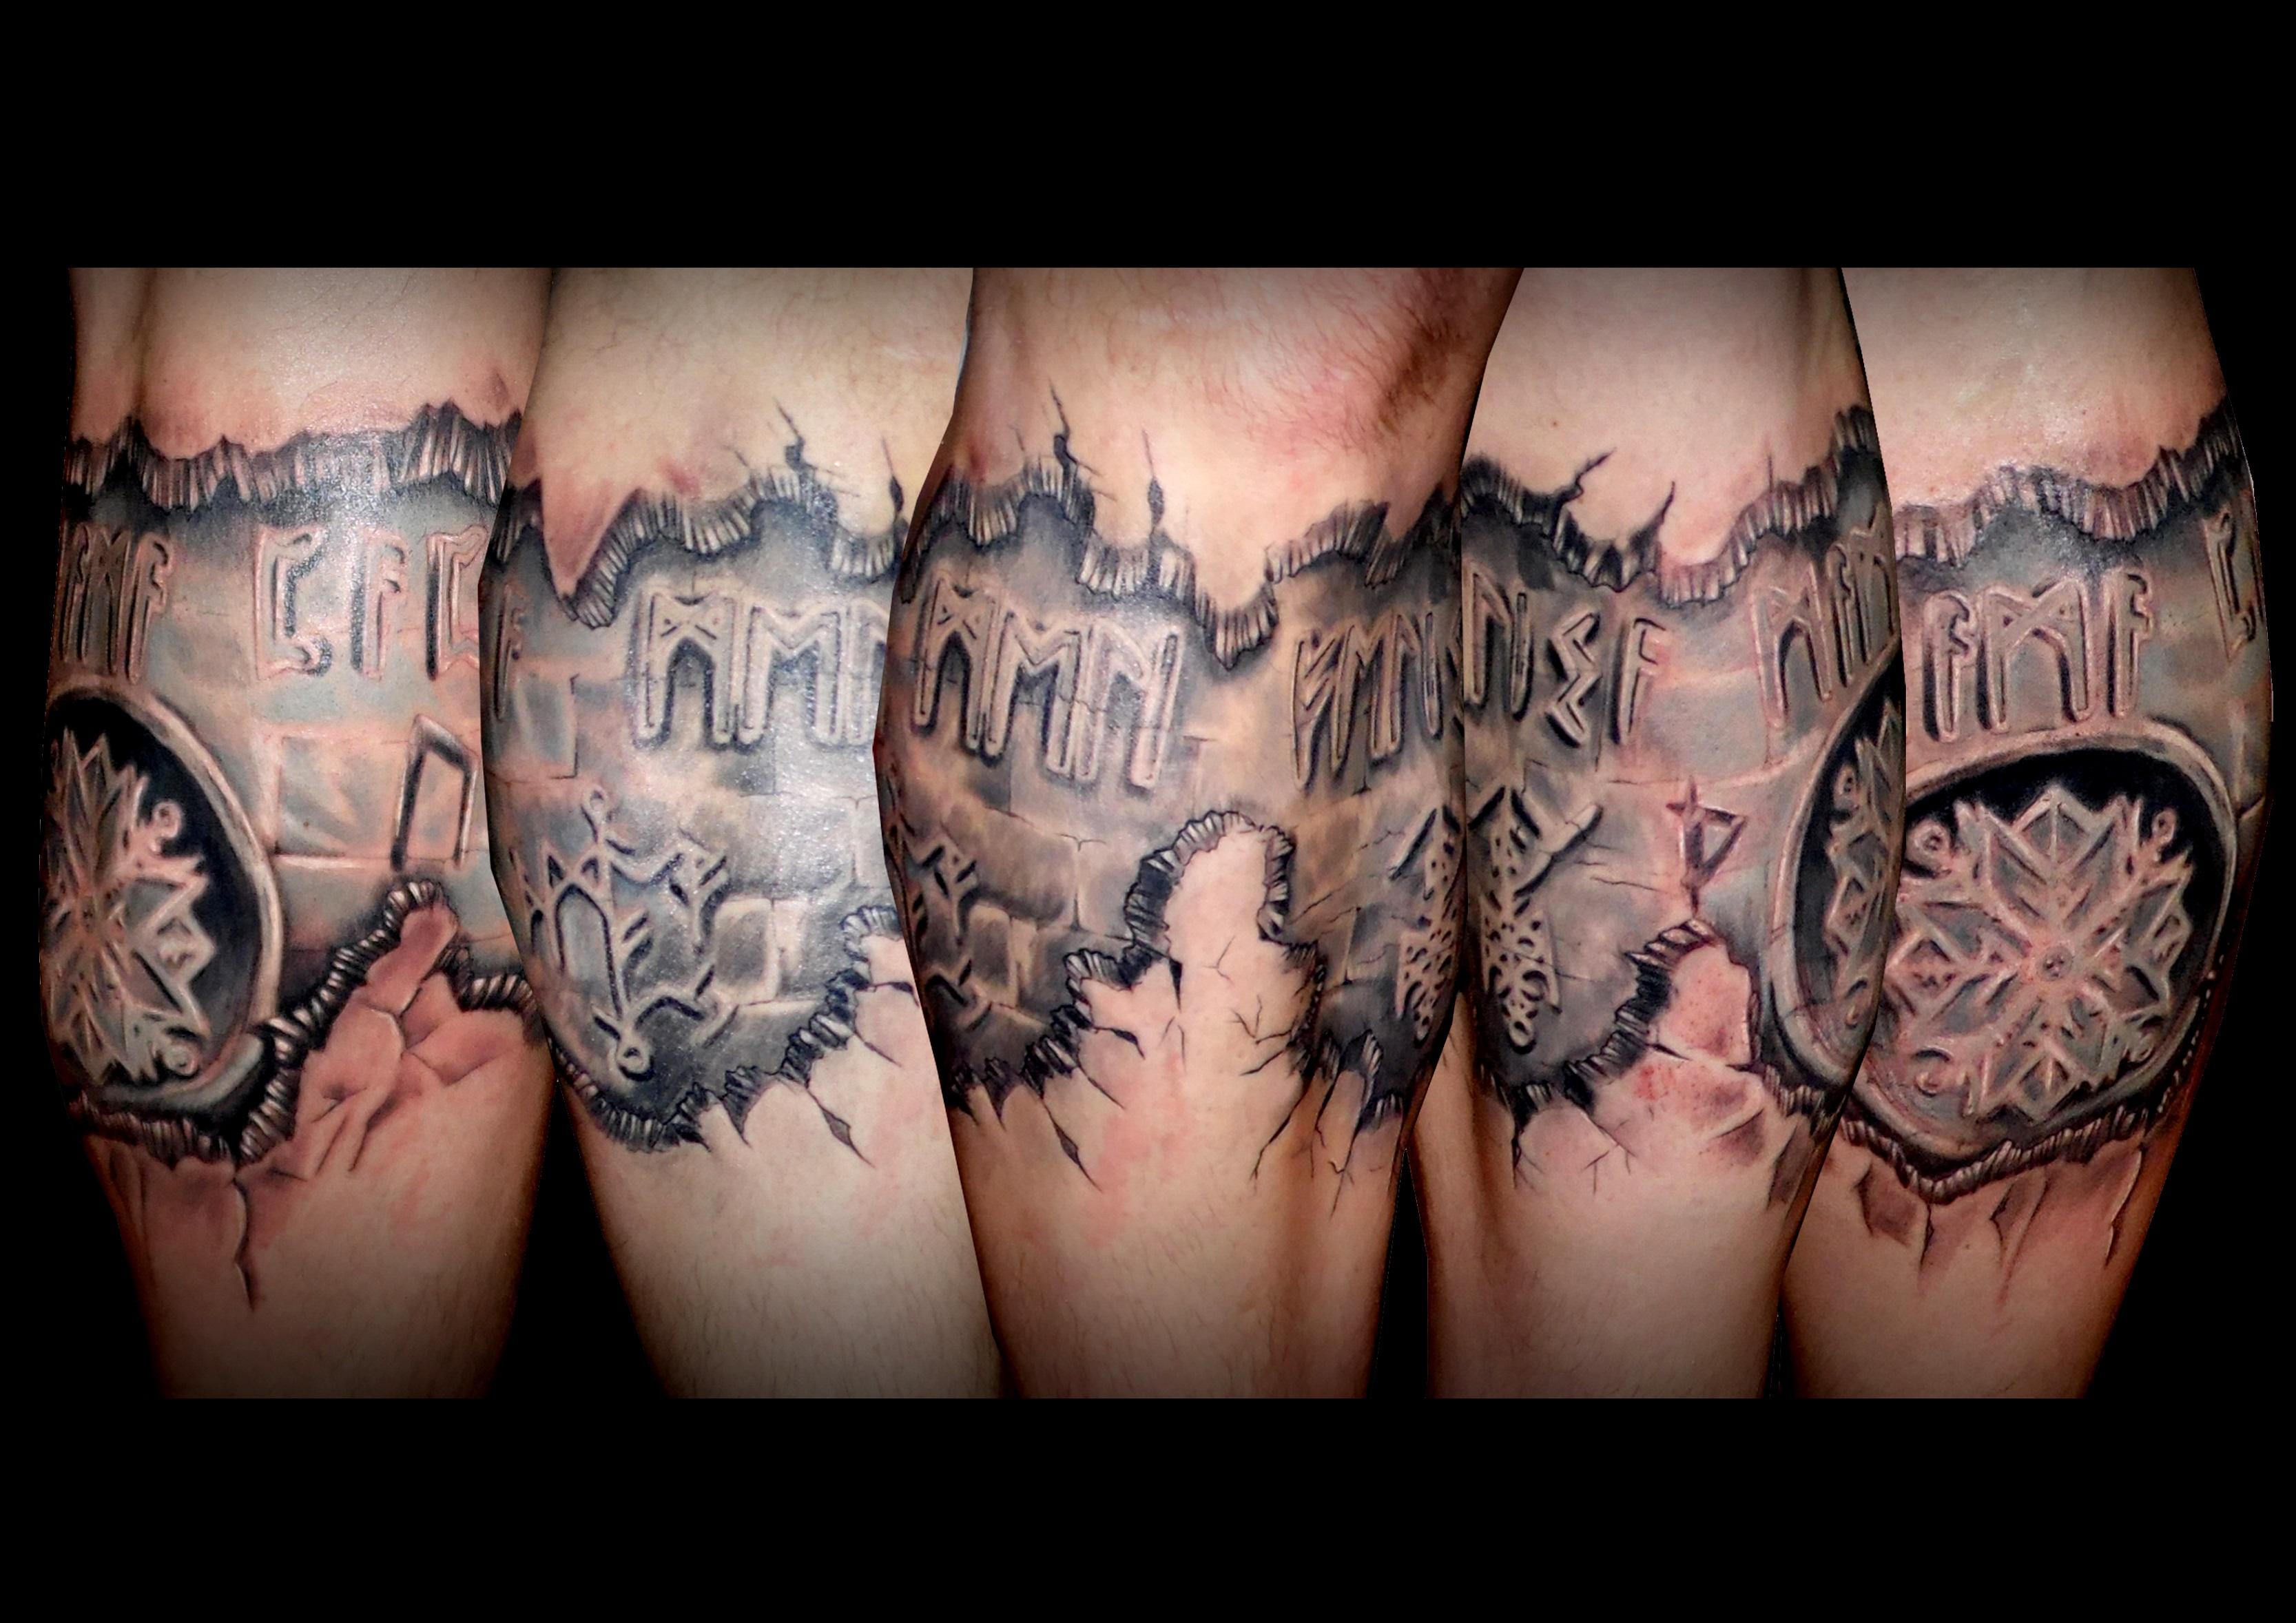 pierna tattoo tatuajes huesca jaca 13depicas rotura vikingos runas grabado piedra gris blanco negro